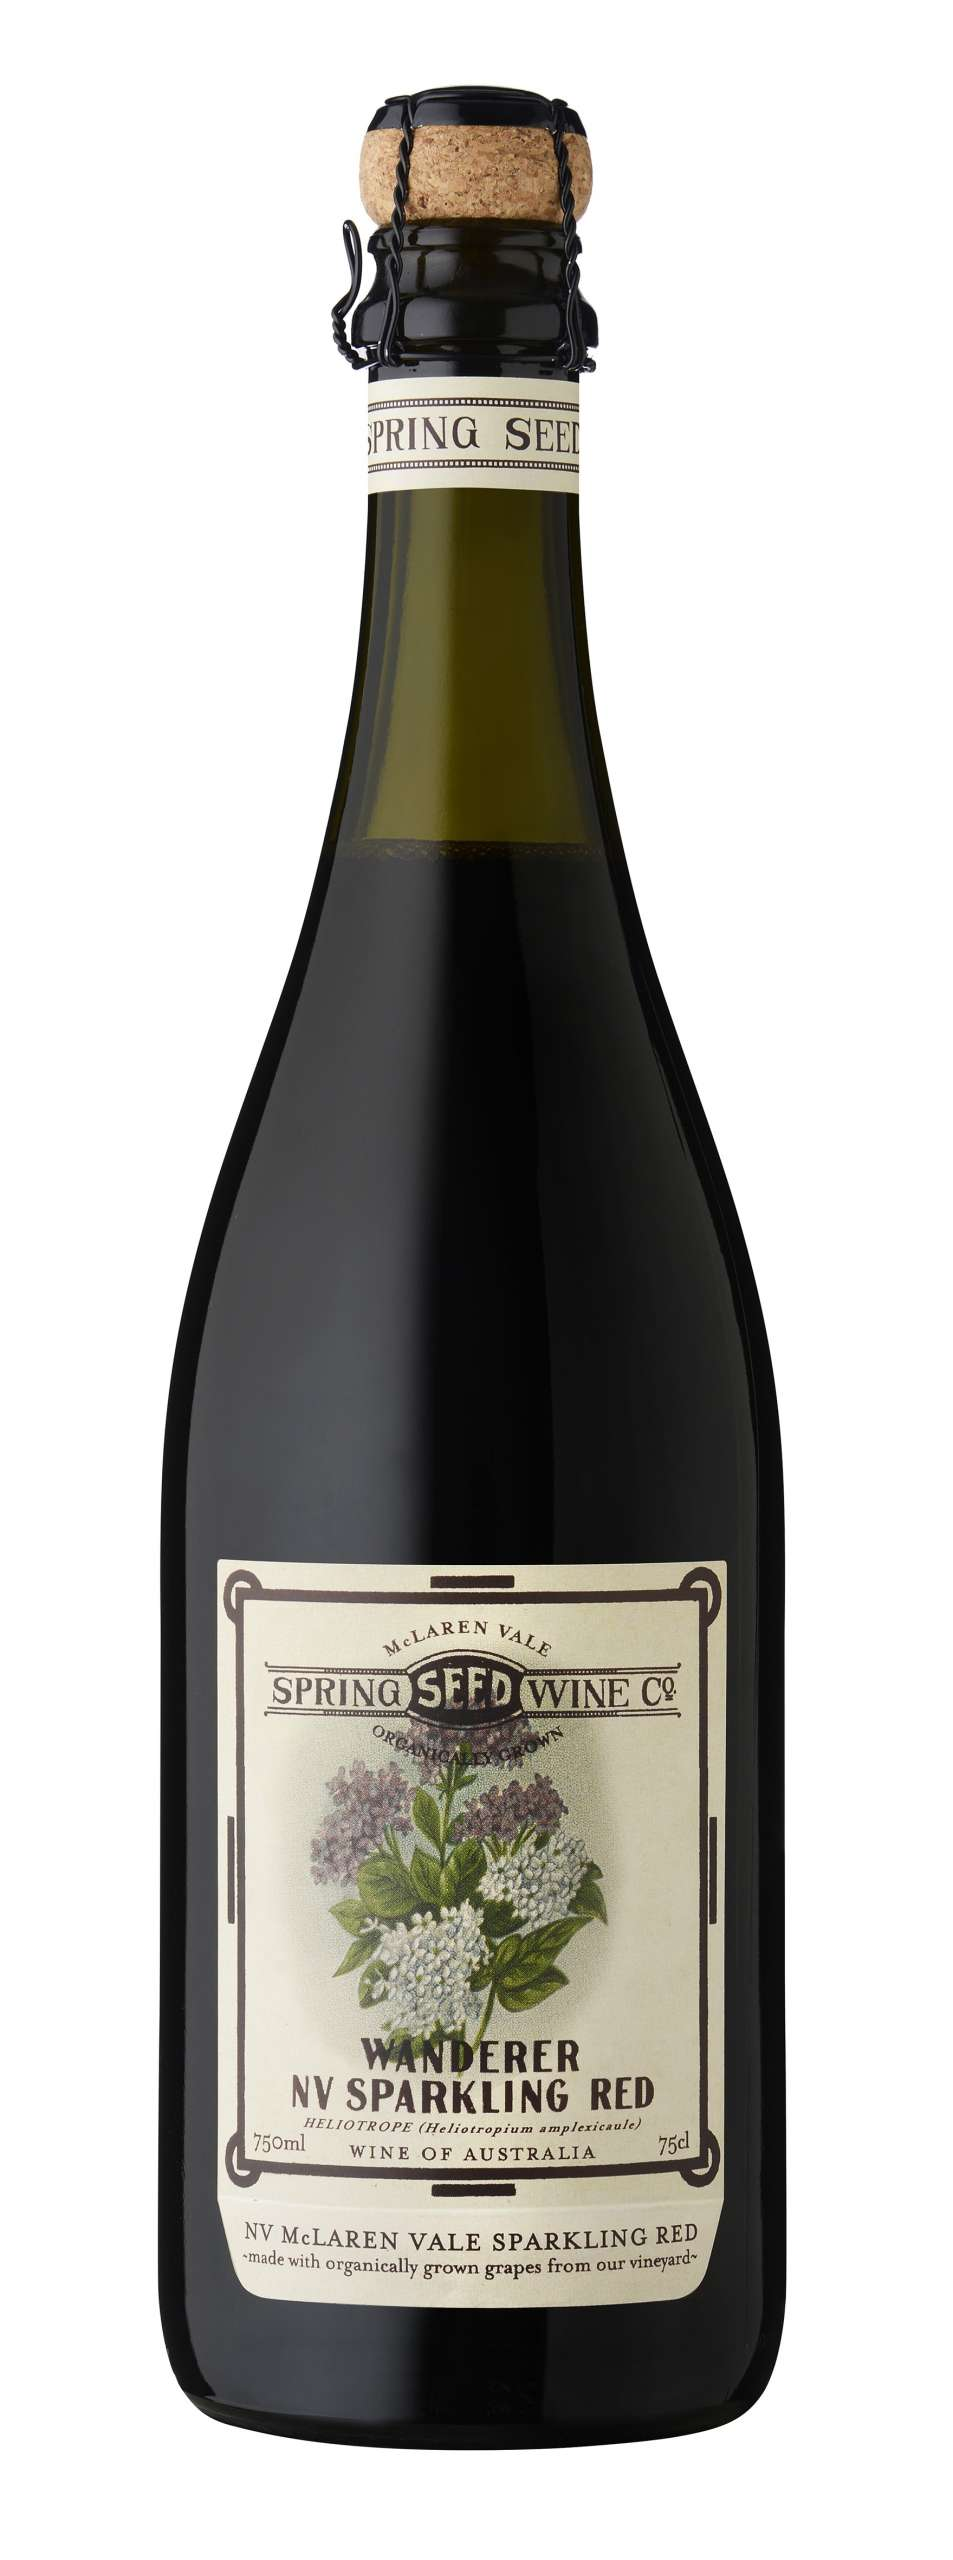 Spring Seed Wine Company 'Wanderer' Sparkling Red N.V. (Organic)-0